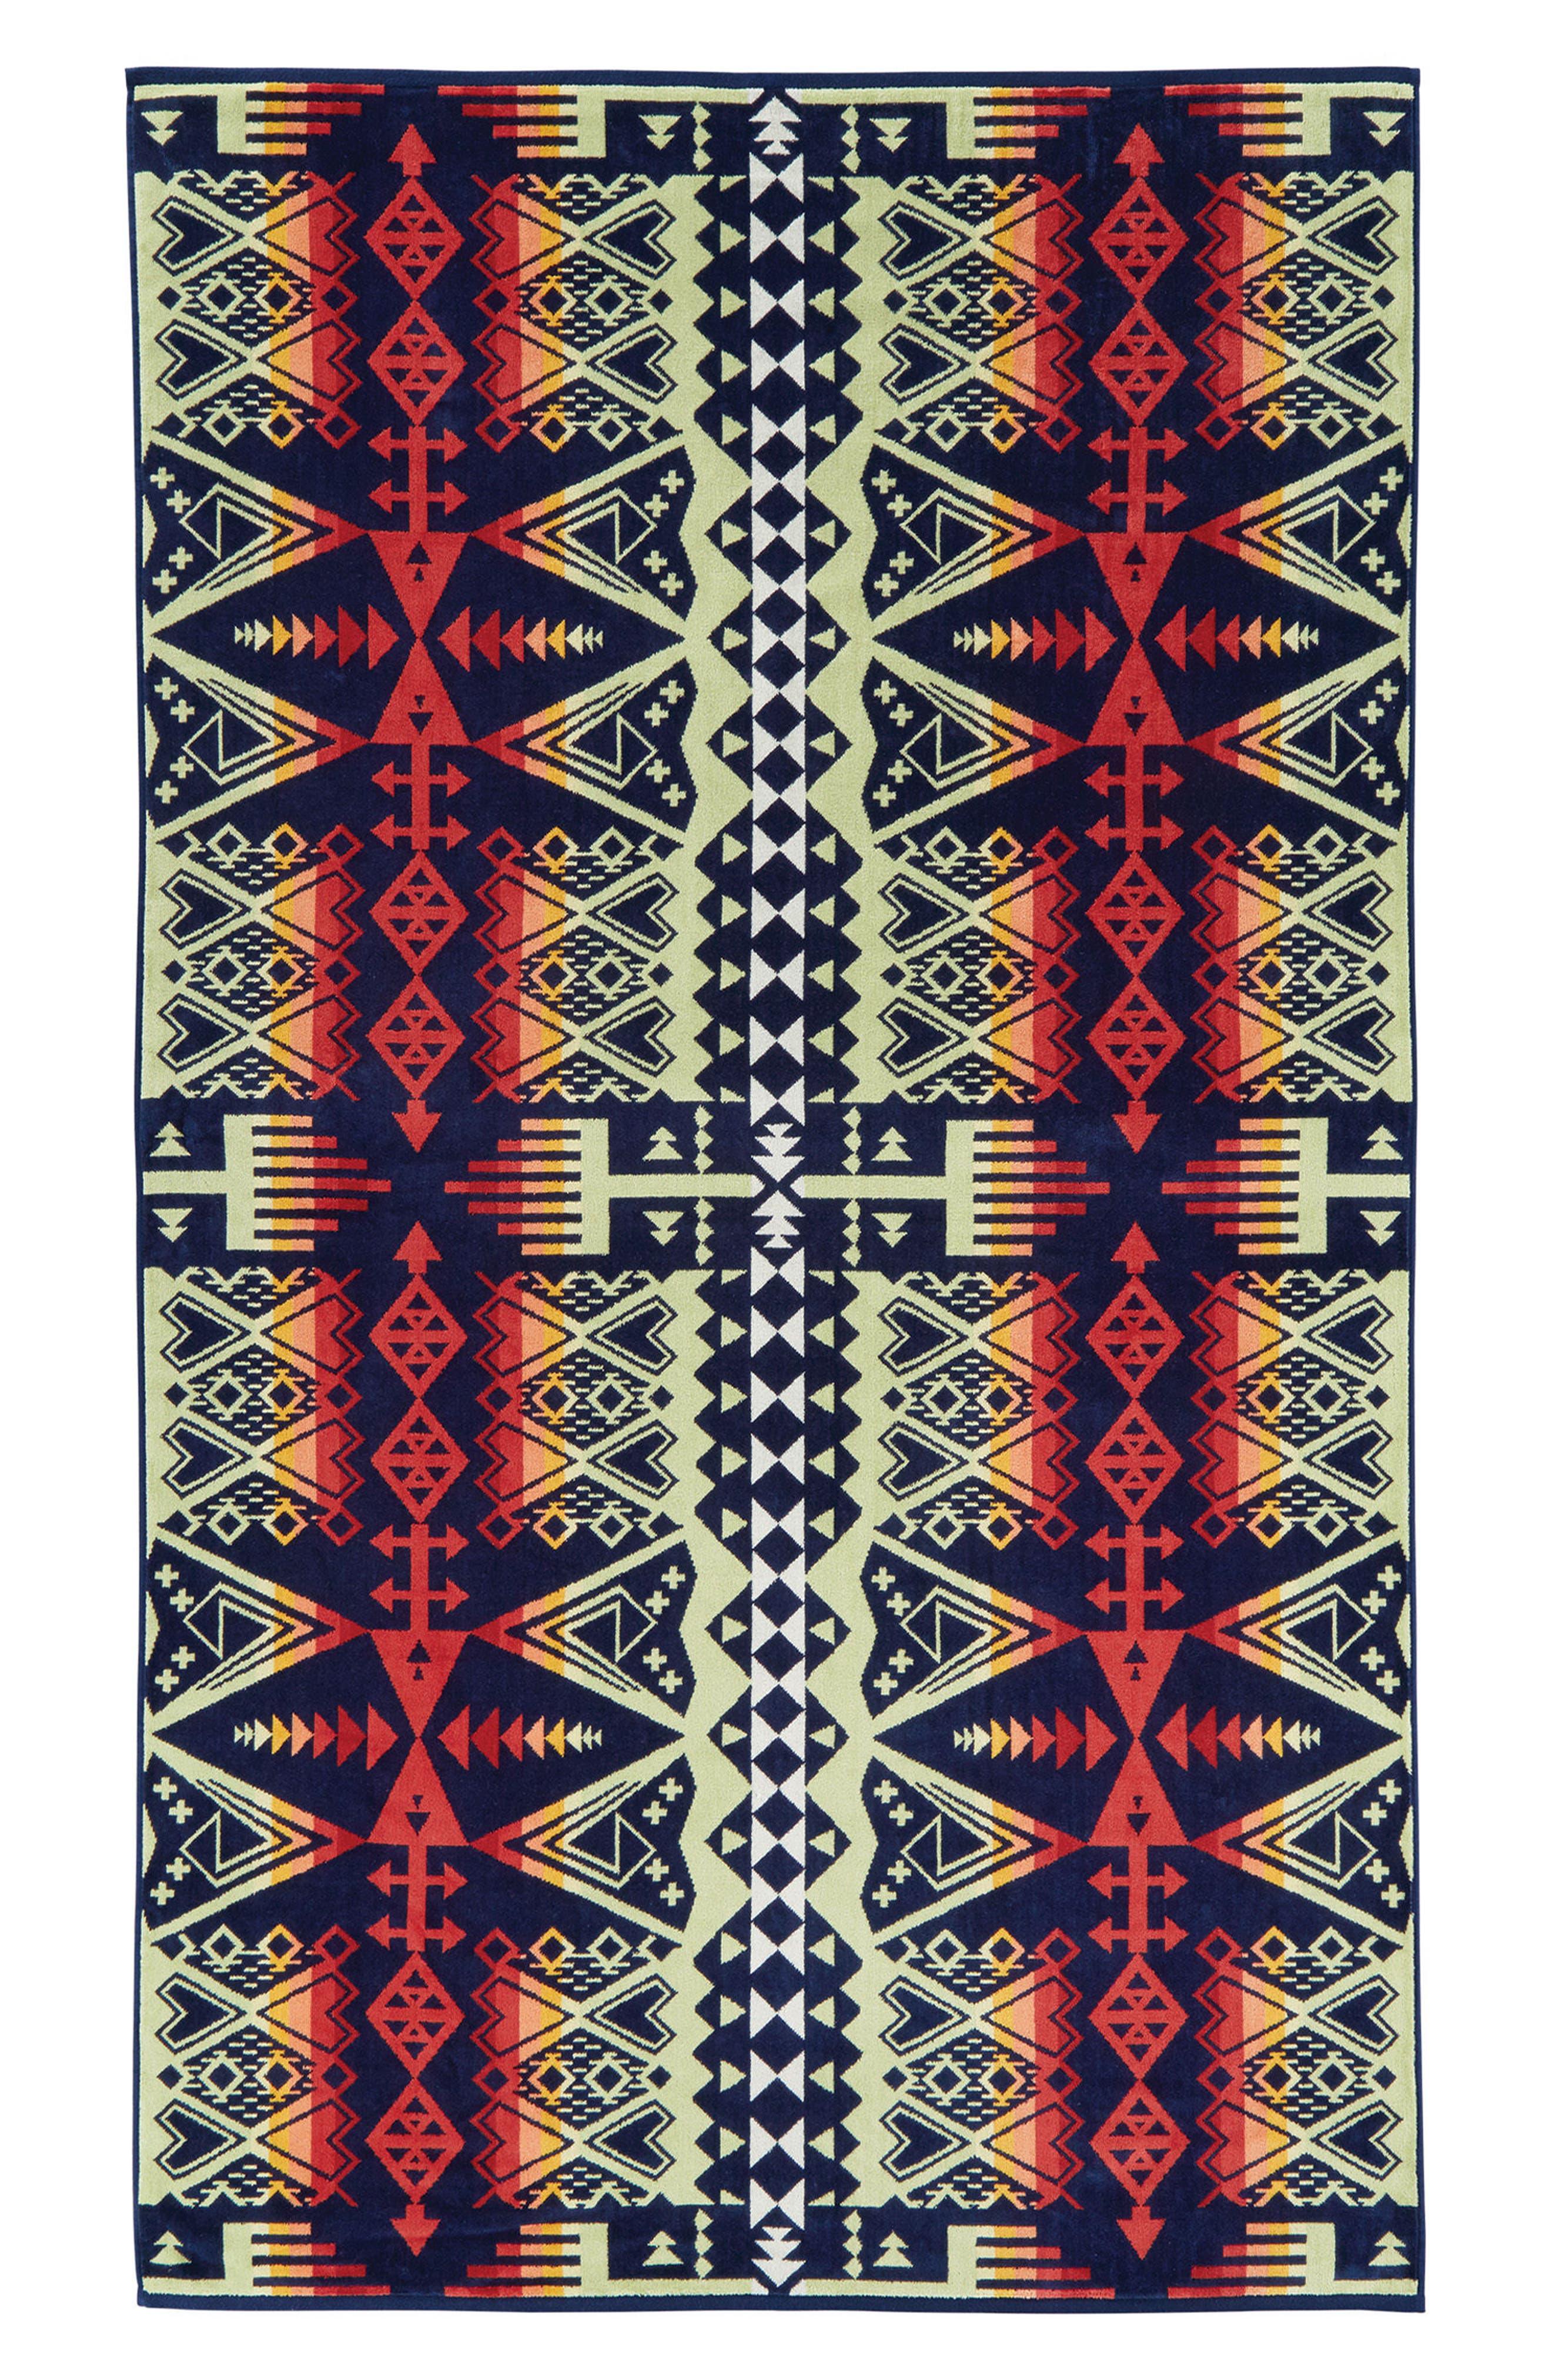 Arrow Revival Jacquard Towel,                             Main thumbnail 1, color,                             Navy